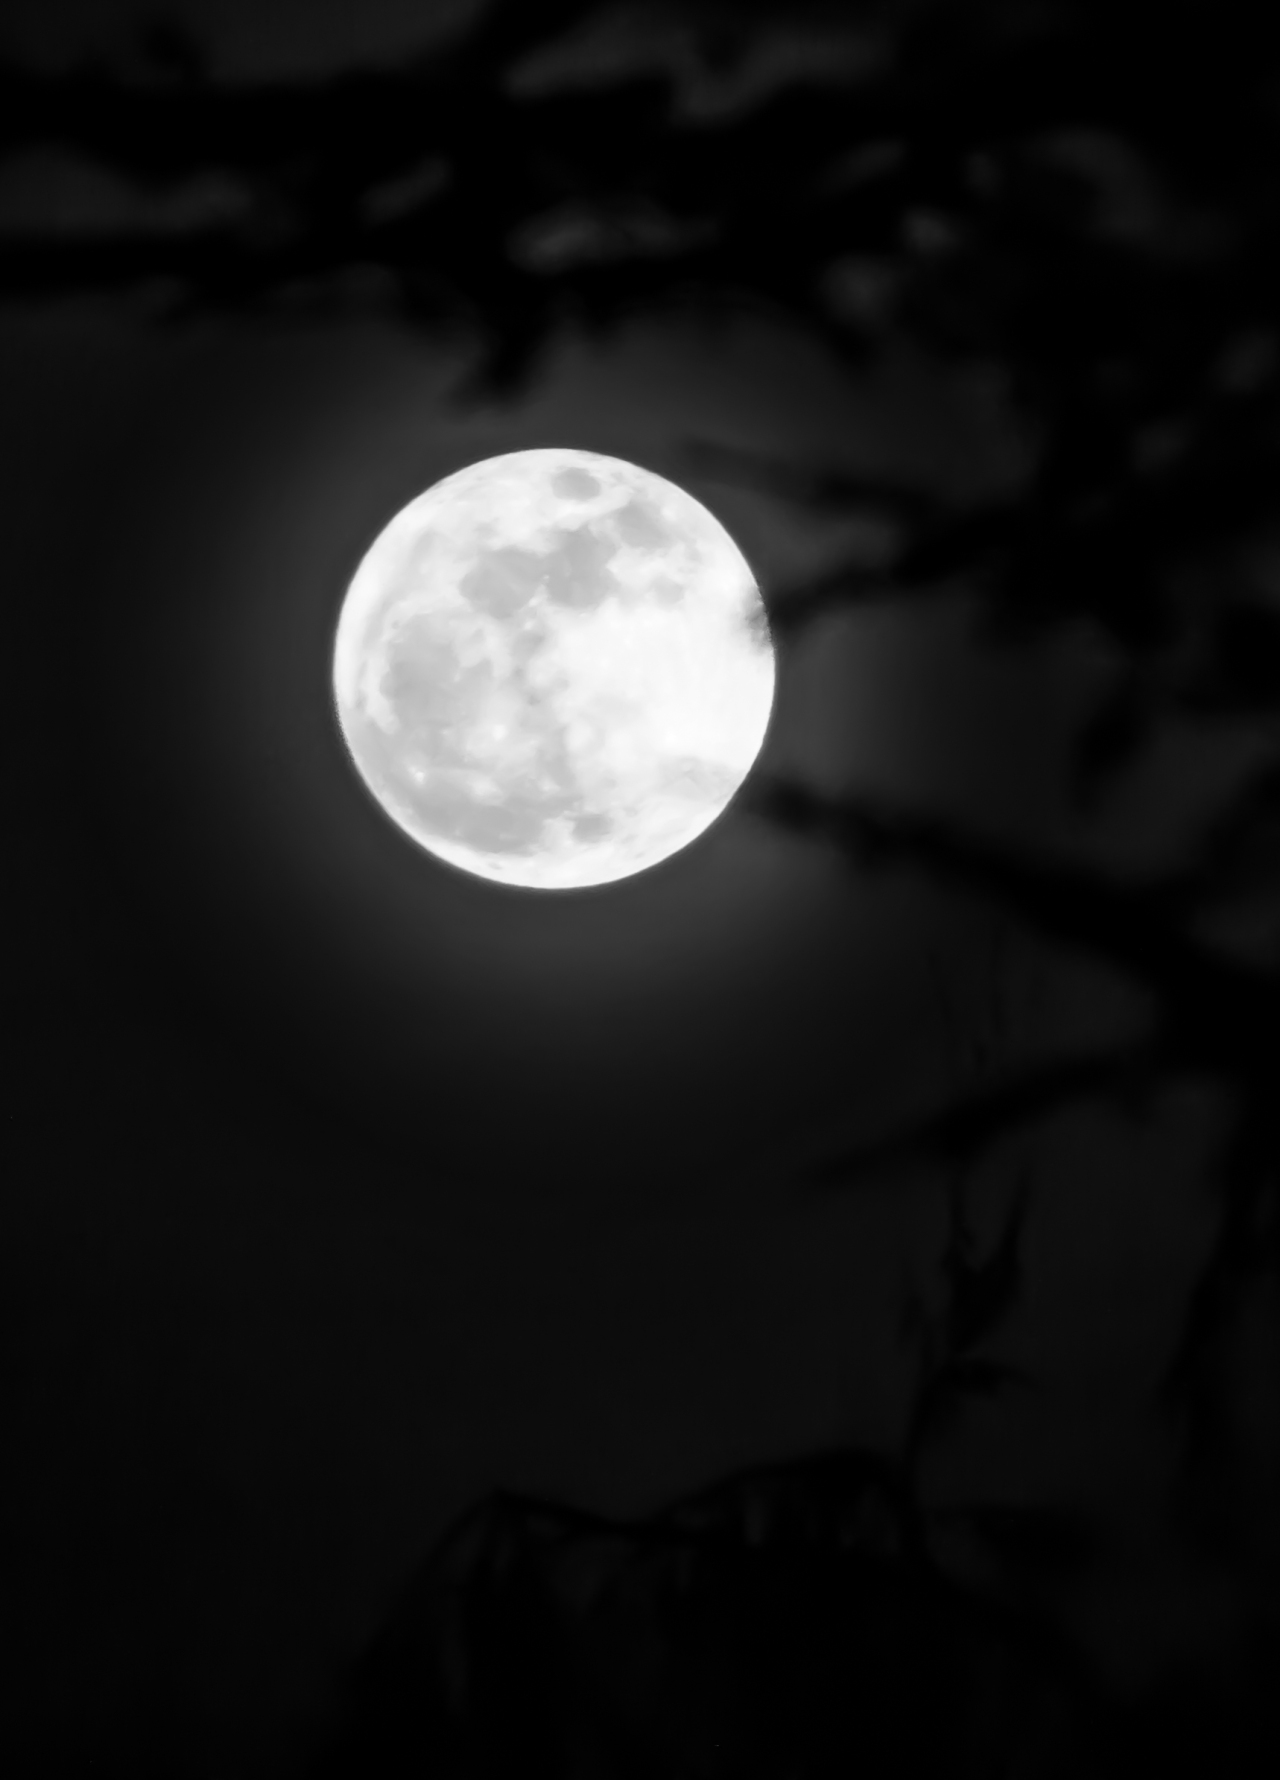 Moon Jan 1 2018 f-1614